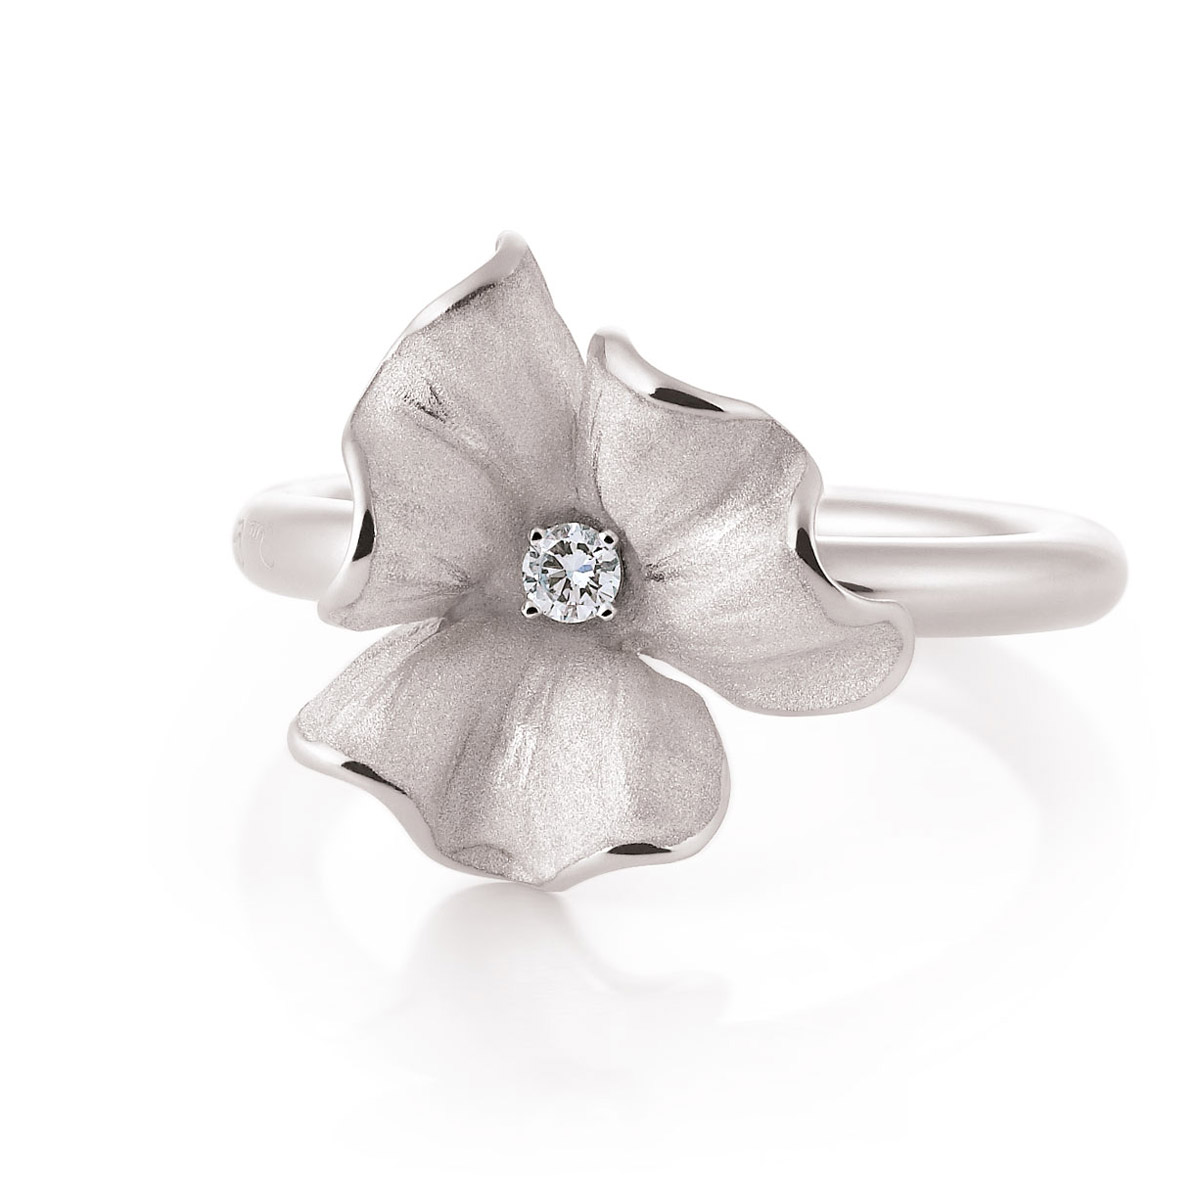 Annamaria Camilli Flower ring en oorbellen